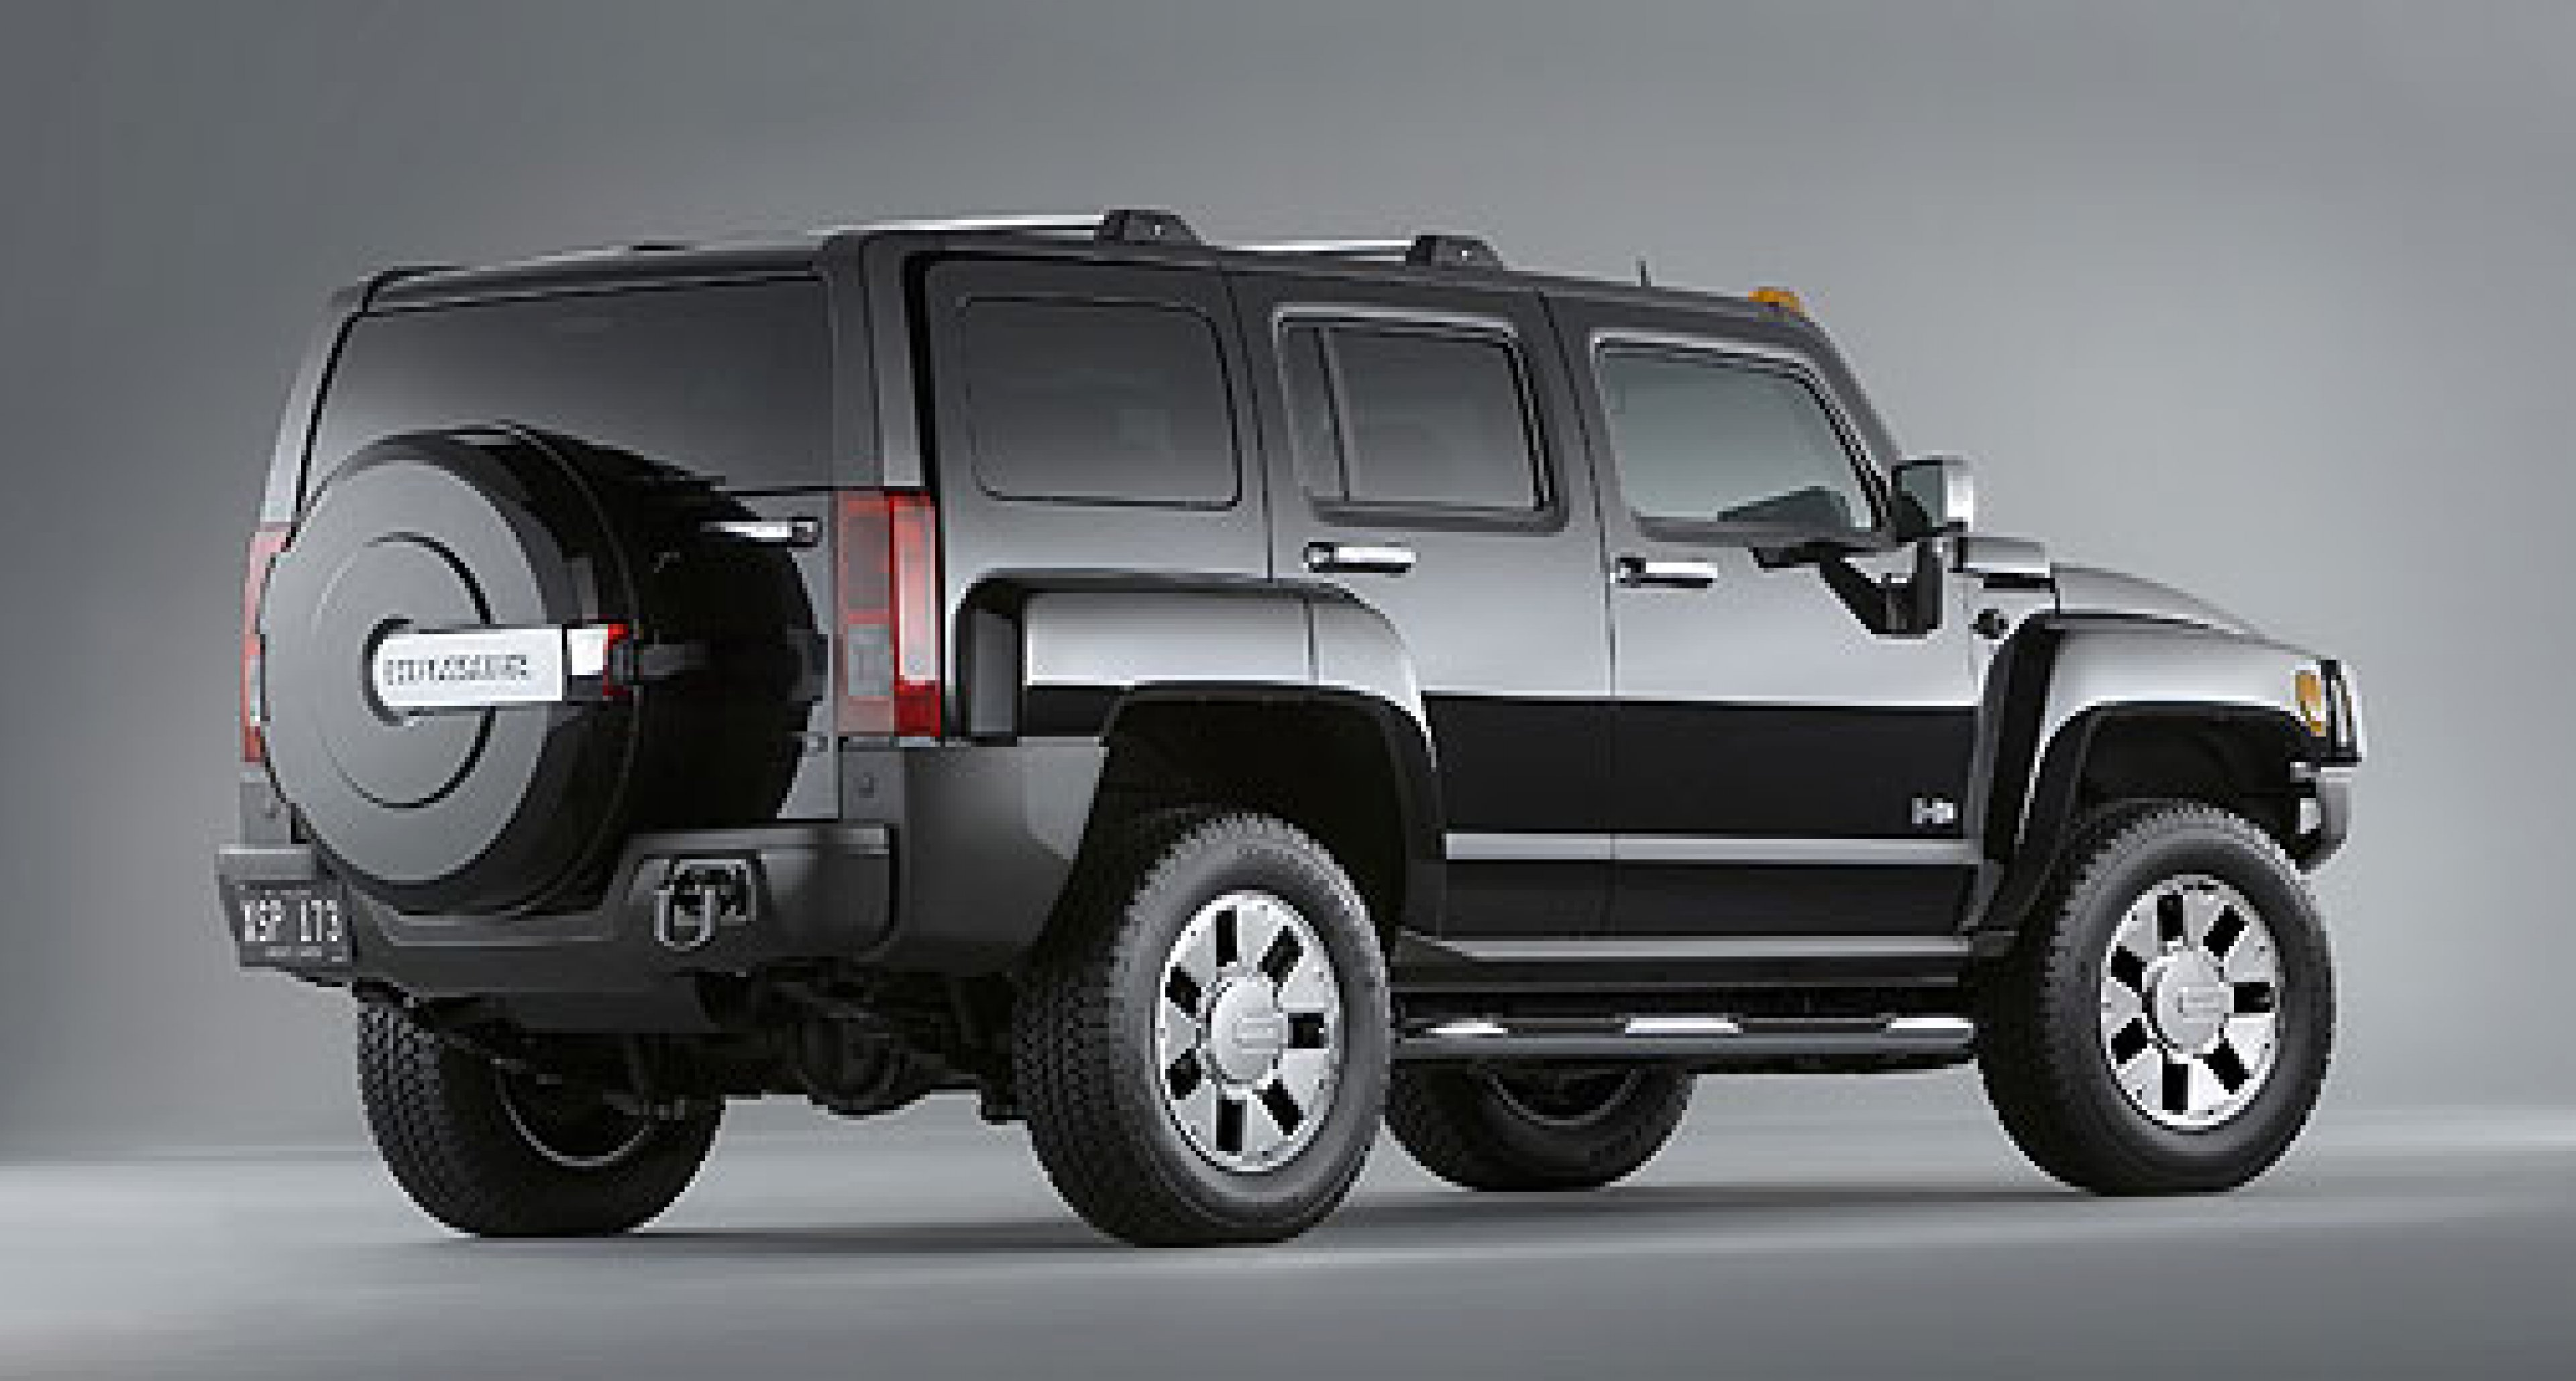 Hummer H3x: Luxus-Hummer